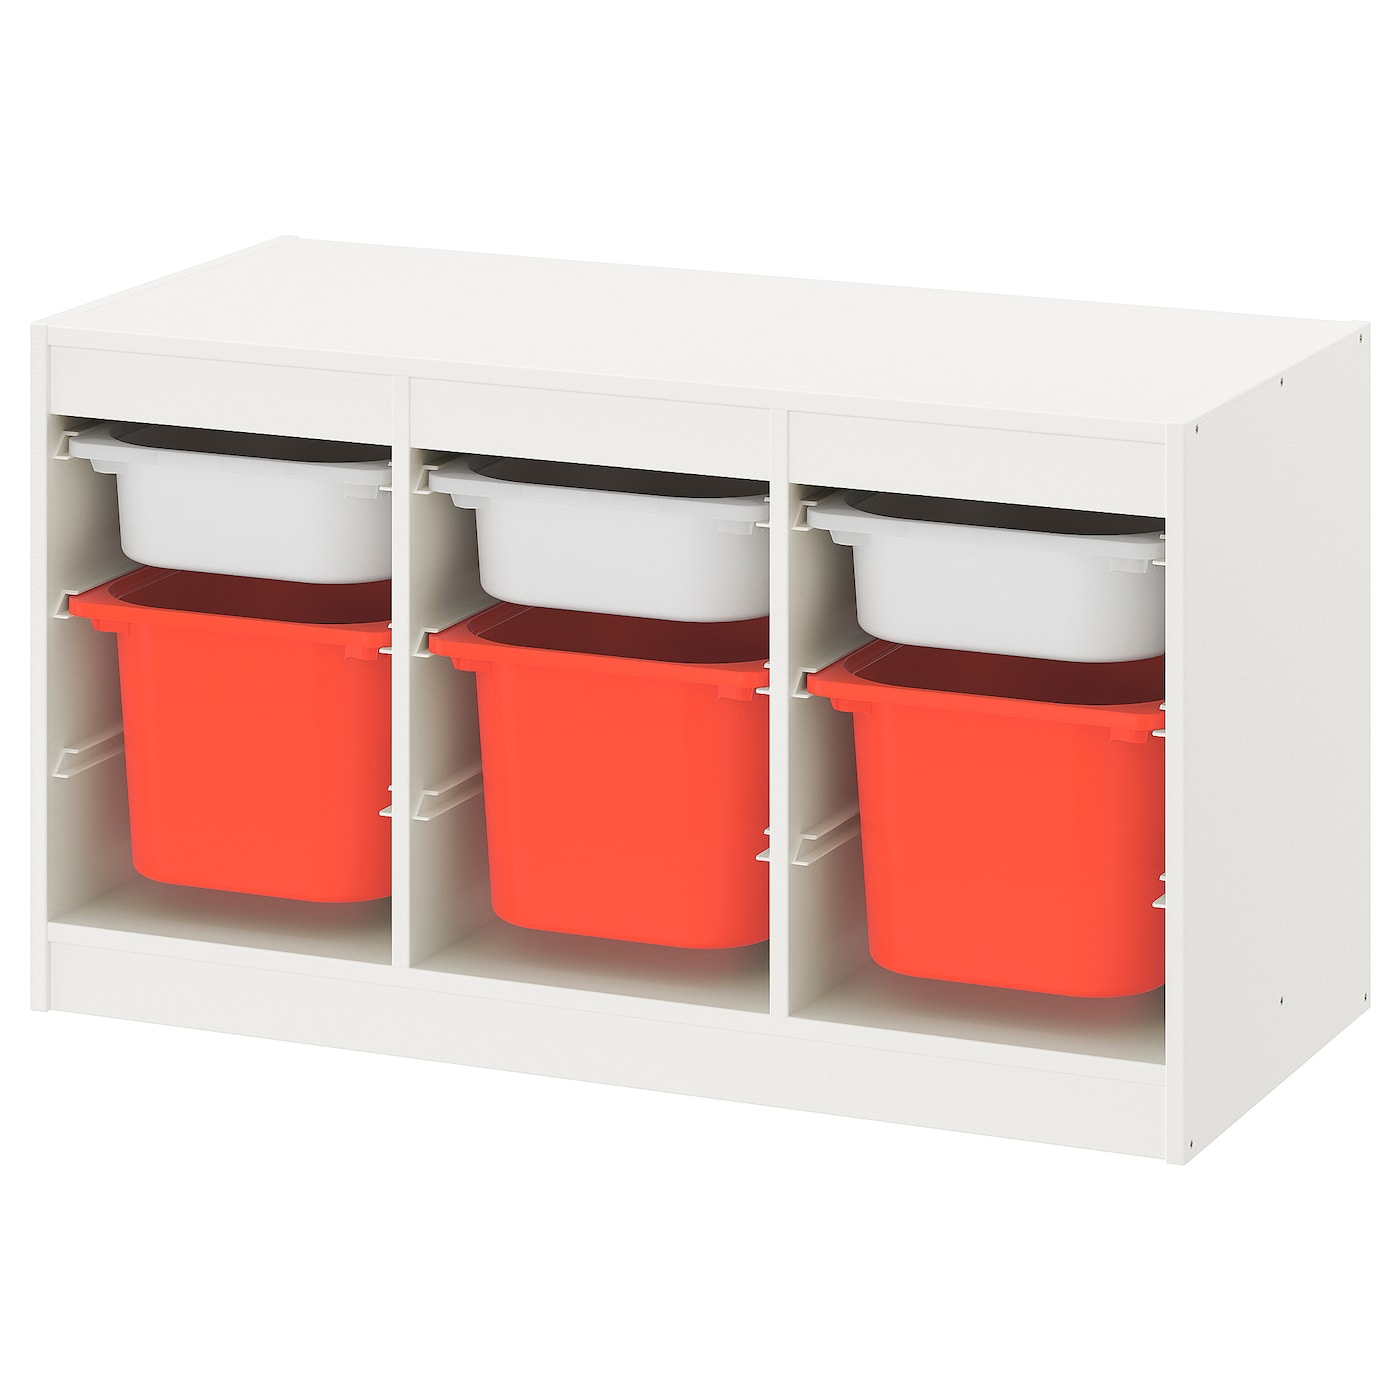 TROFAST Combi rangement+boîtes, blanc blanc, orange, 99x44x56 cm - IKEA